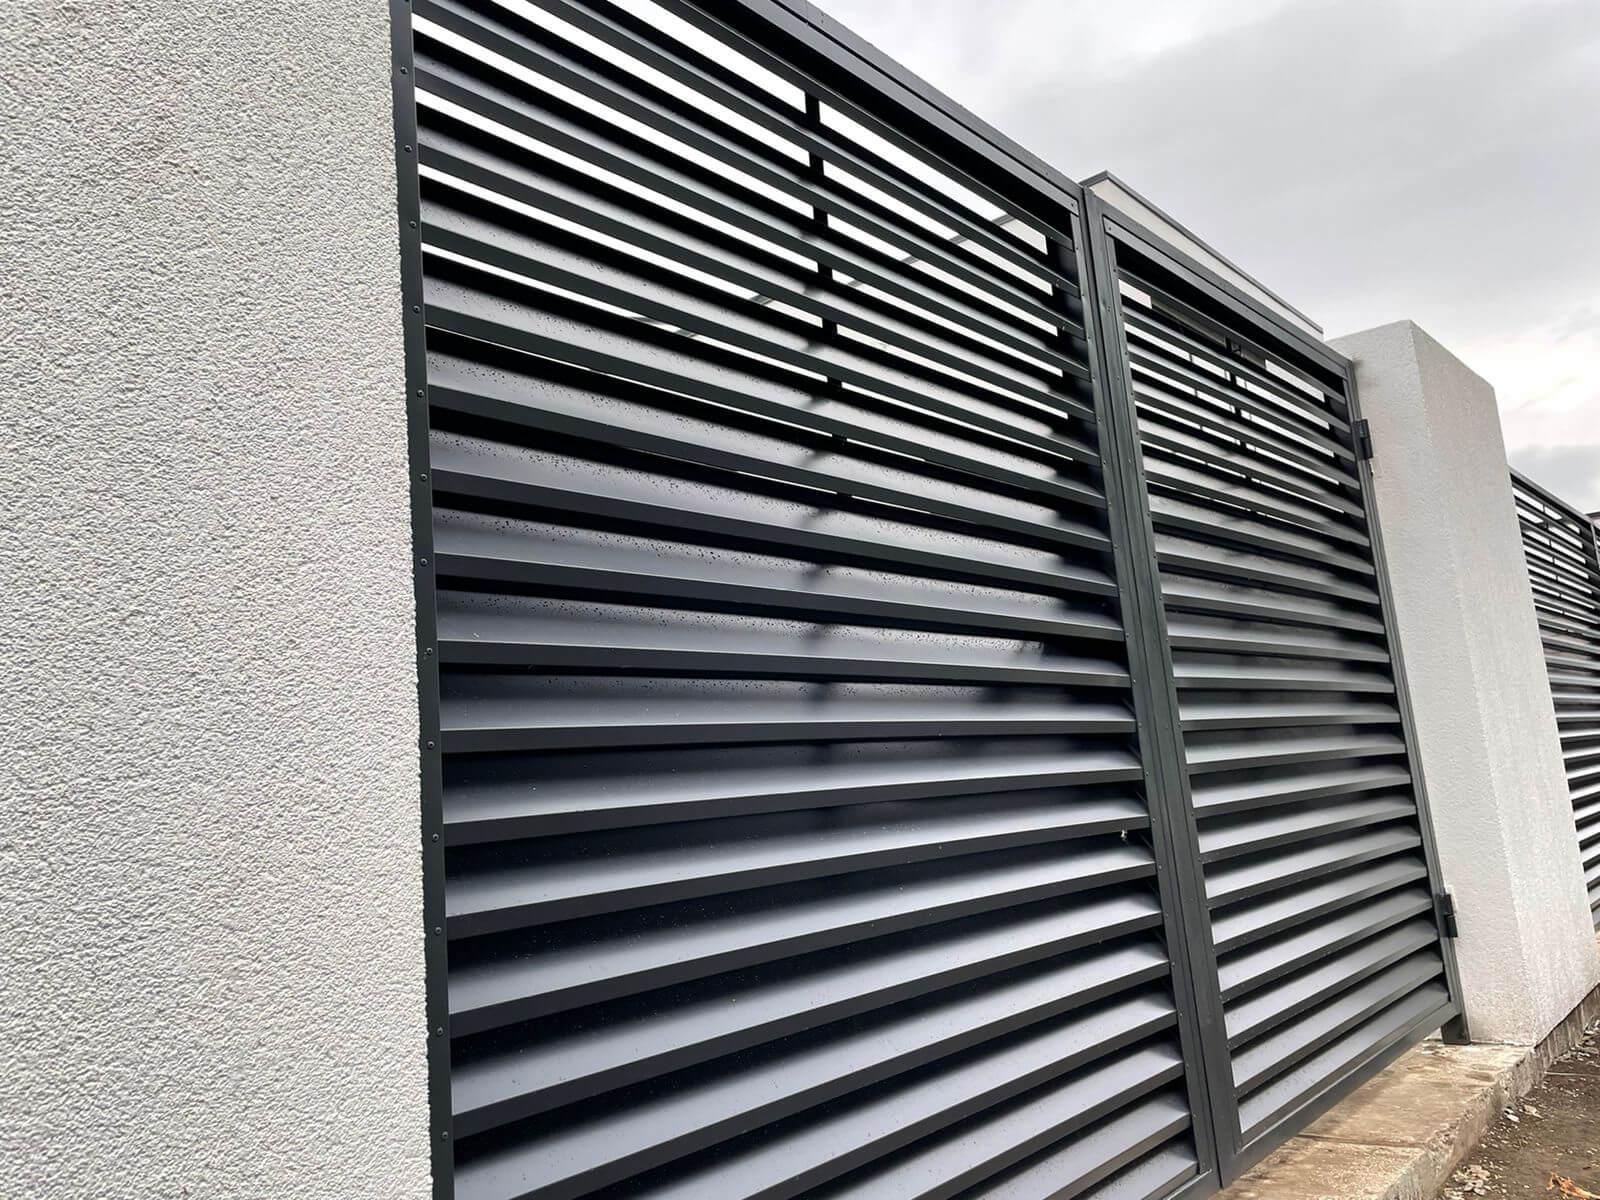 забор-жалюзи с ламелями ЭКО-Z Серый Графит двухсторонний фото2